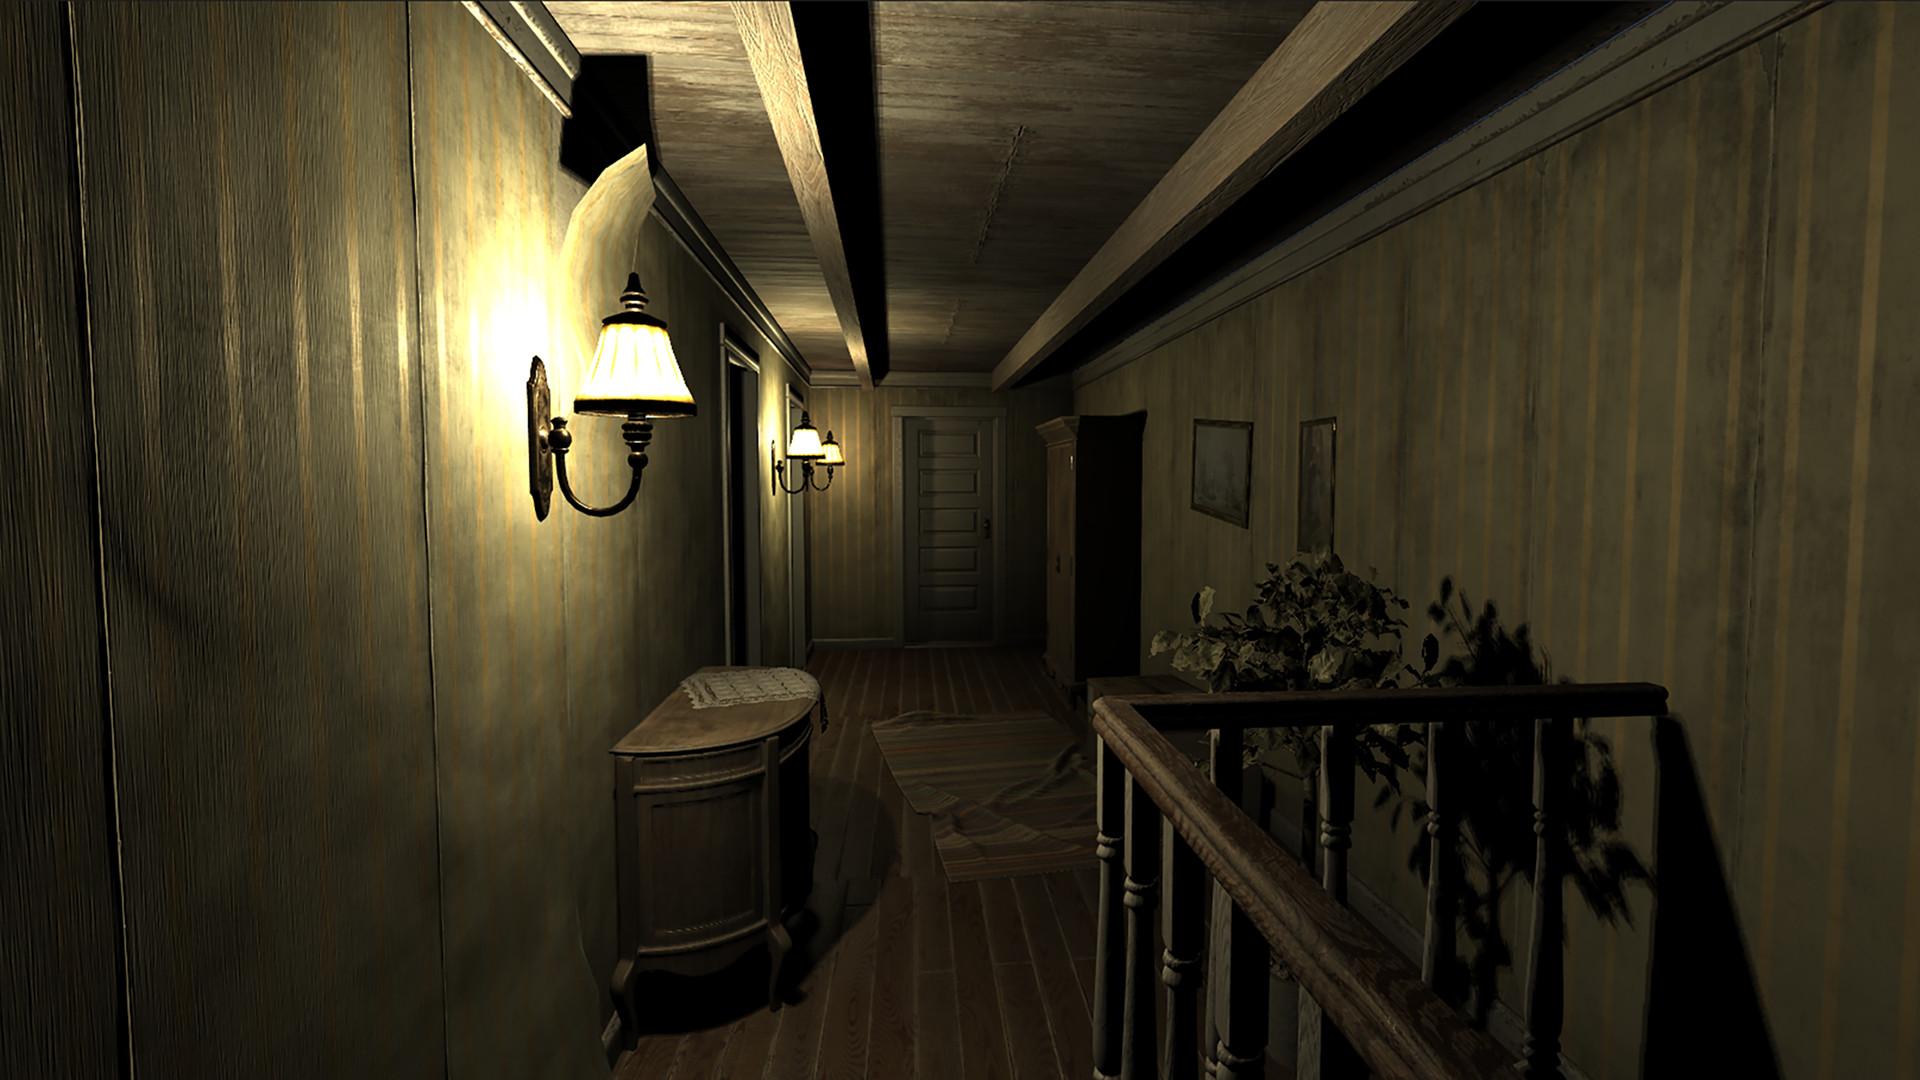 Oculus Quest 游戏《Descending 》降序I 梦魇之屋插图(1)